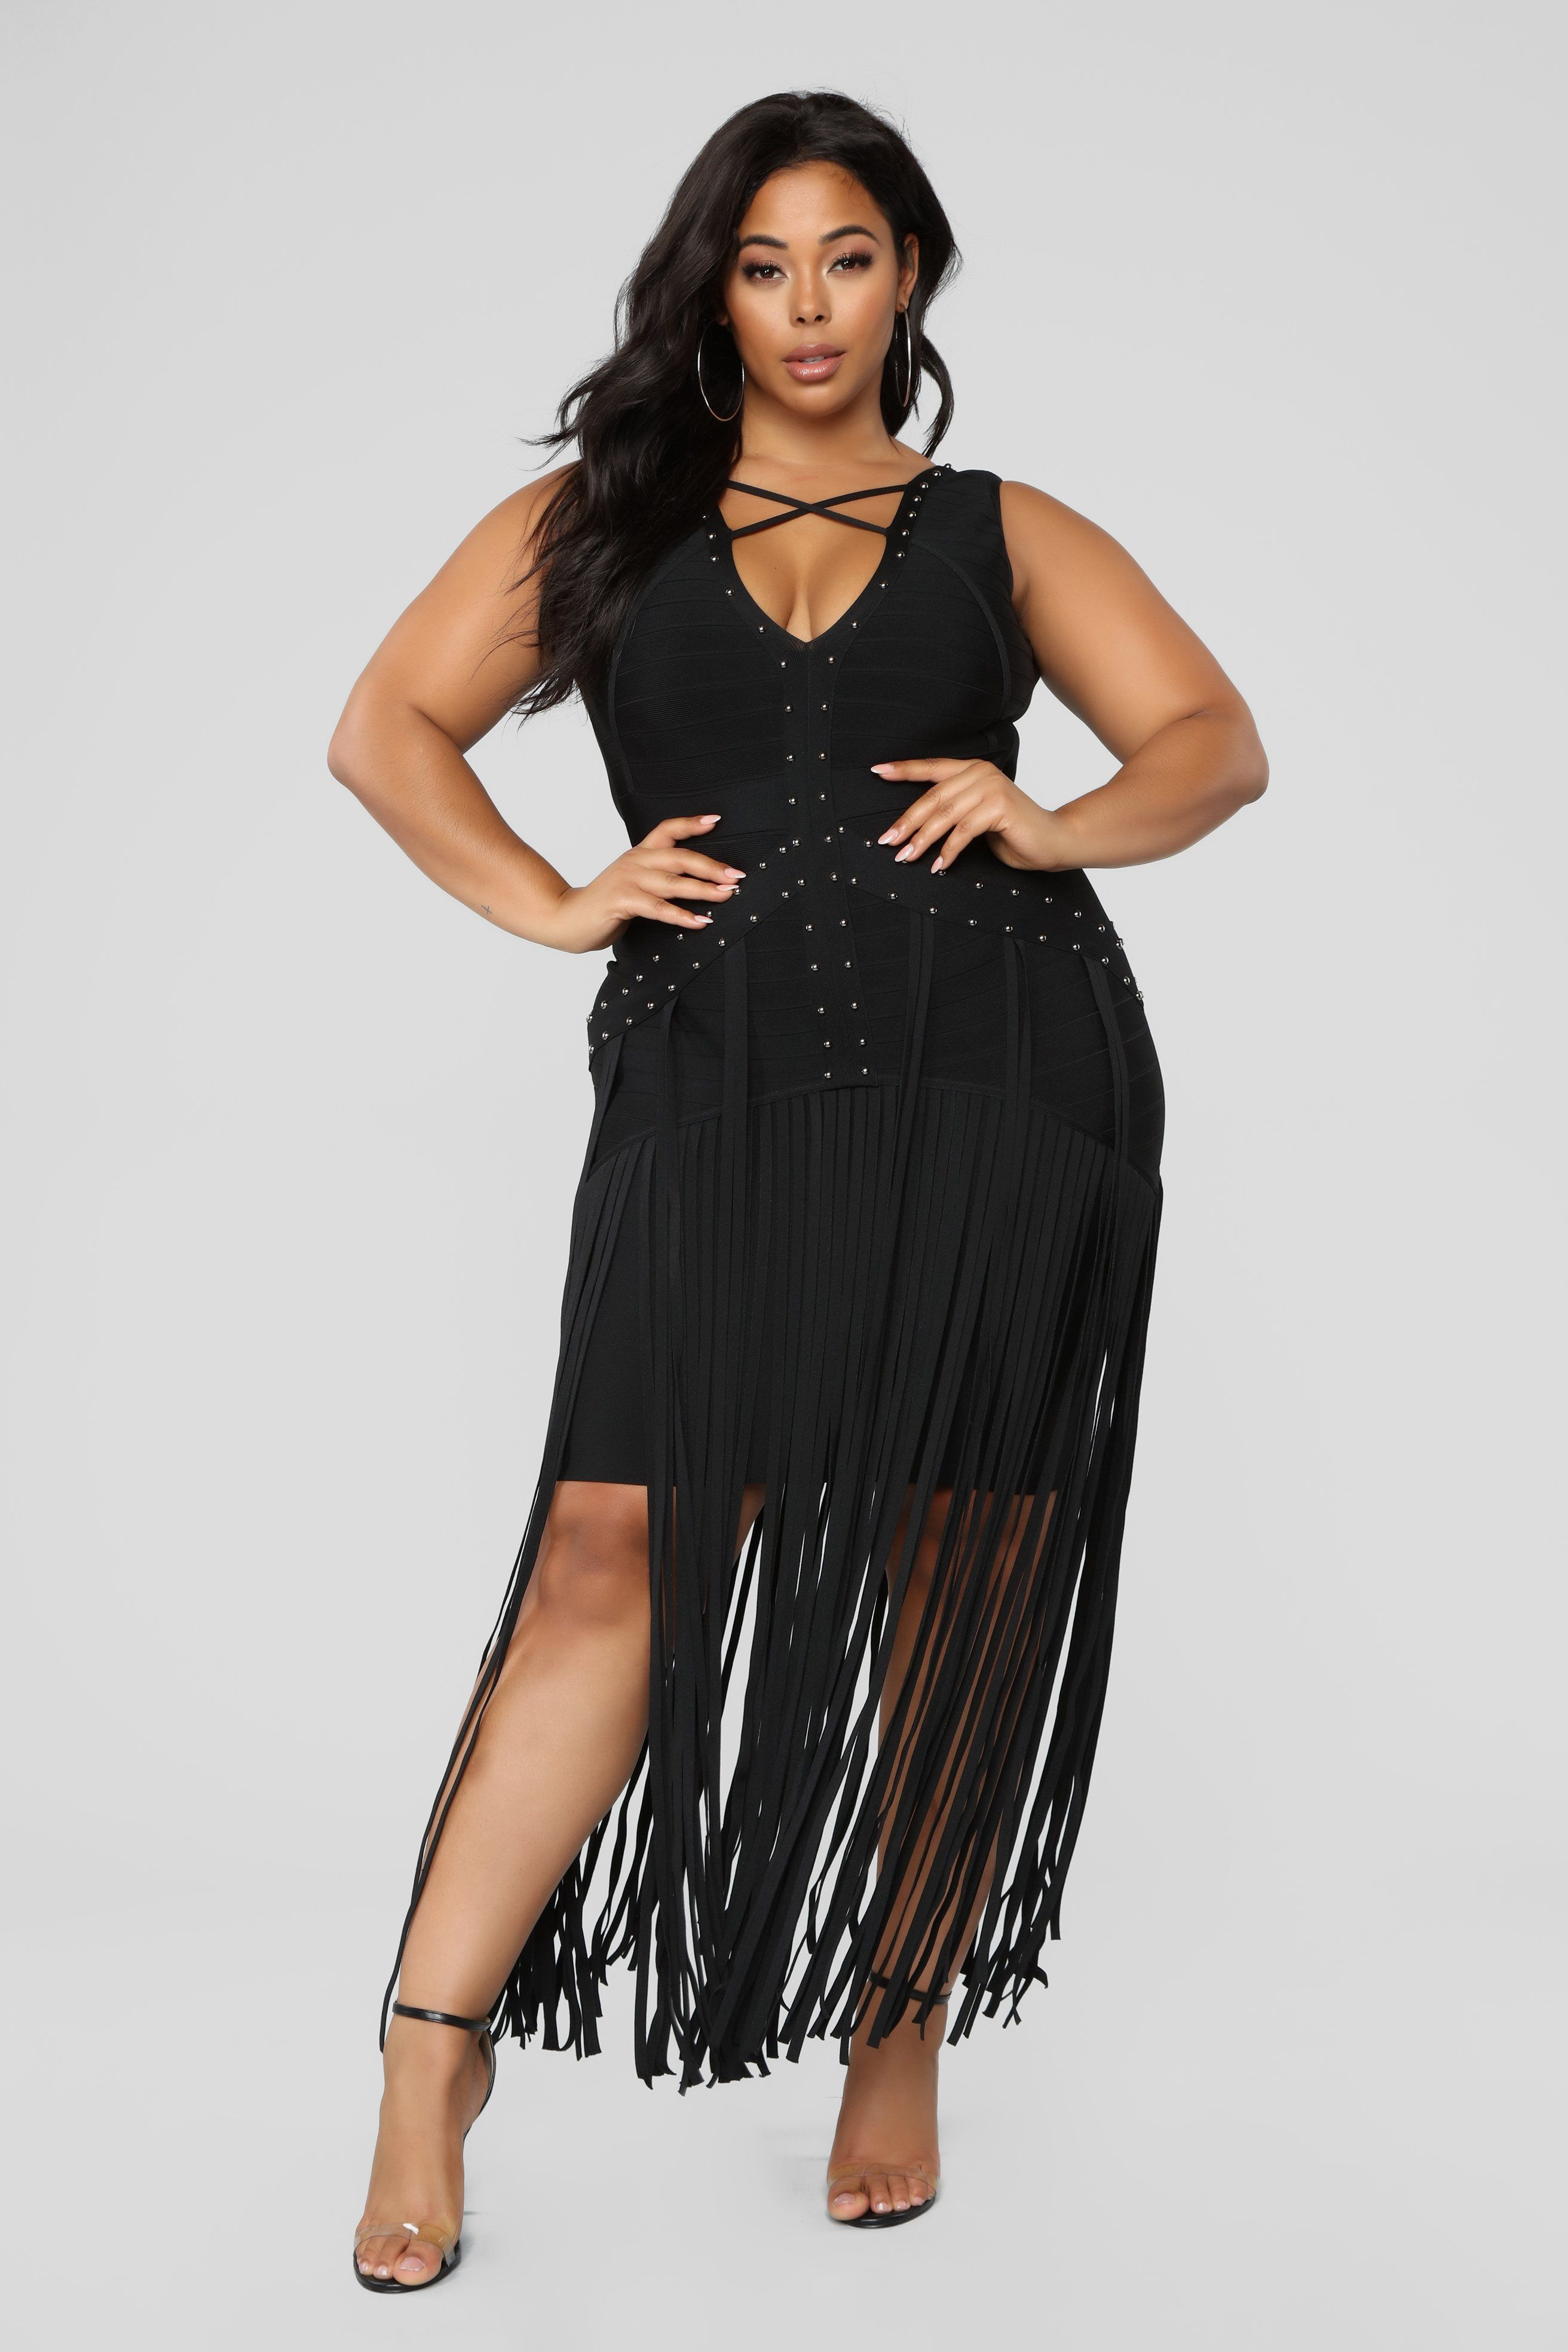 Shimmy Through Life Bandage Dress - Black | My fave Fashions ...